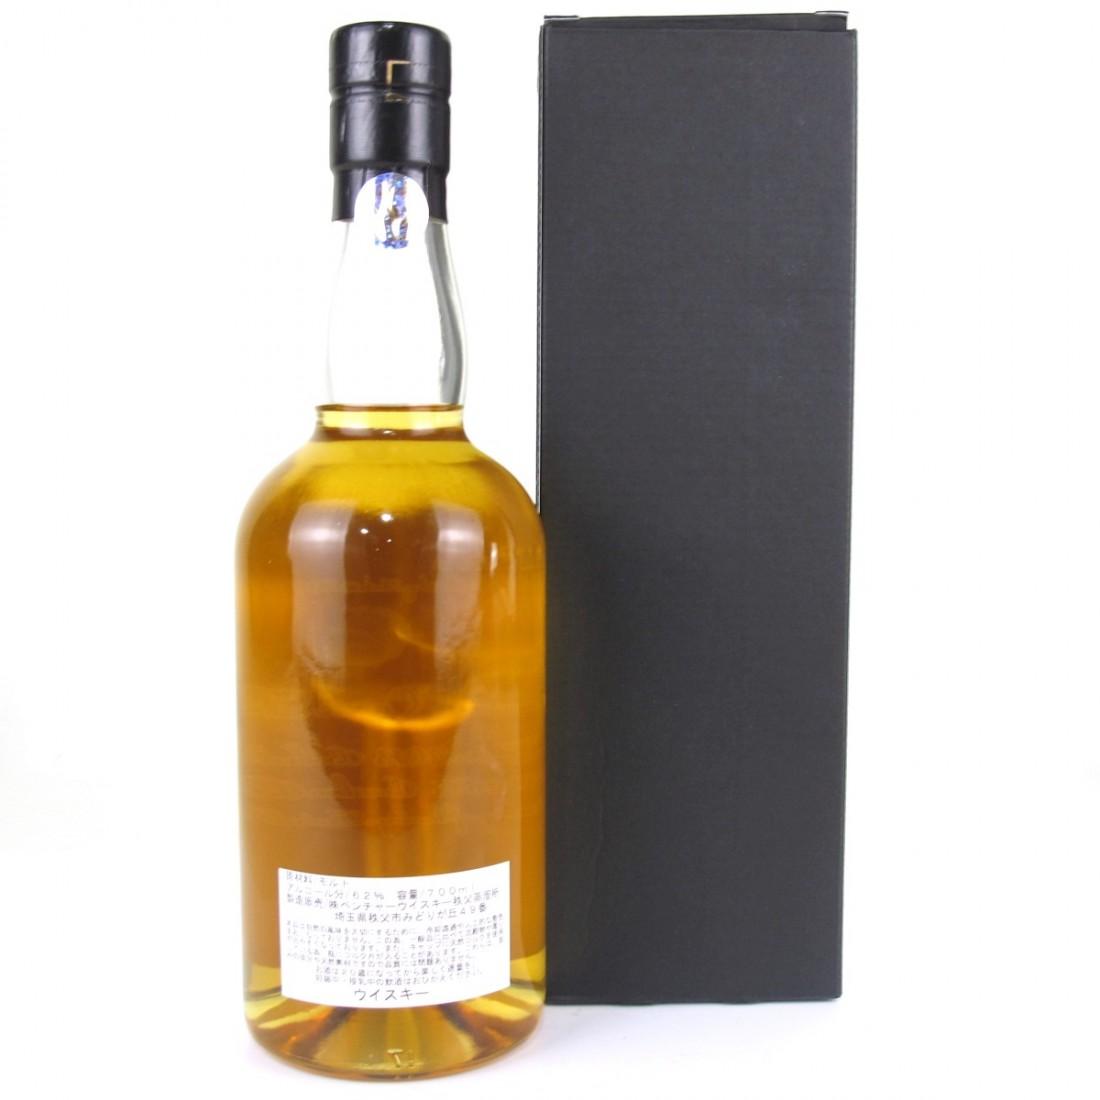 Chichibu 2013 Ichiro's Malt Single Cask Peated #2655 / Modern Malt Whisky Market